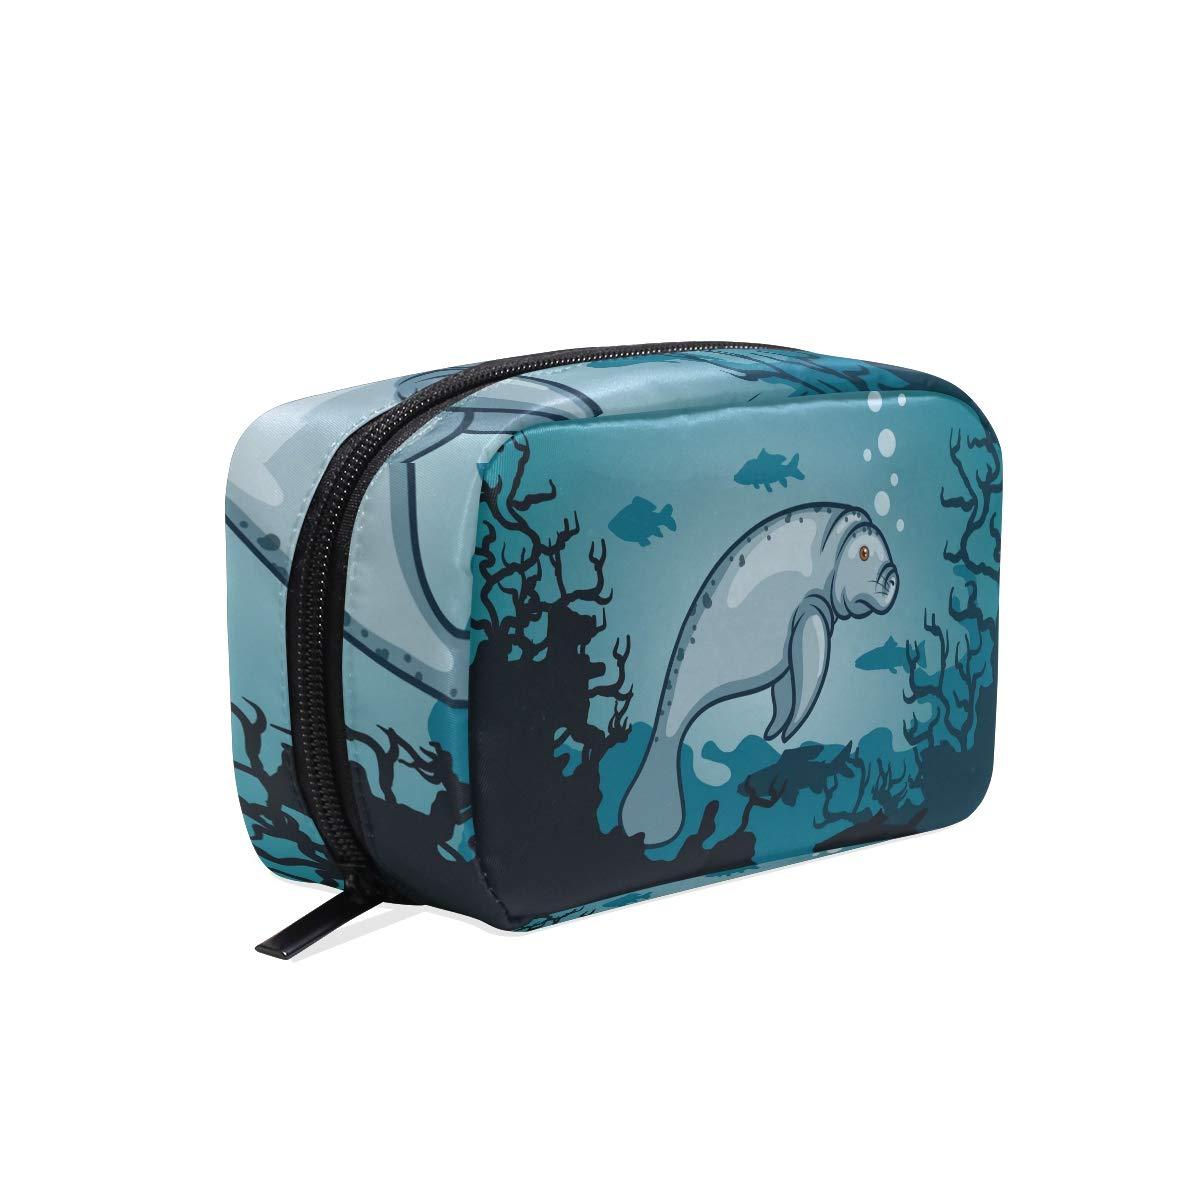 357431a5fb22 Amazon.com : HELVOON Manatee Ocean Sea Underwater Cosmetic Bag ...